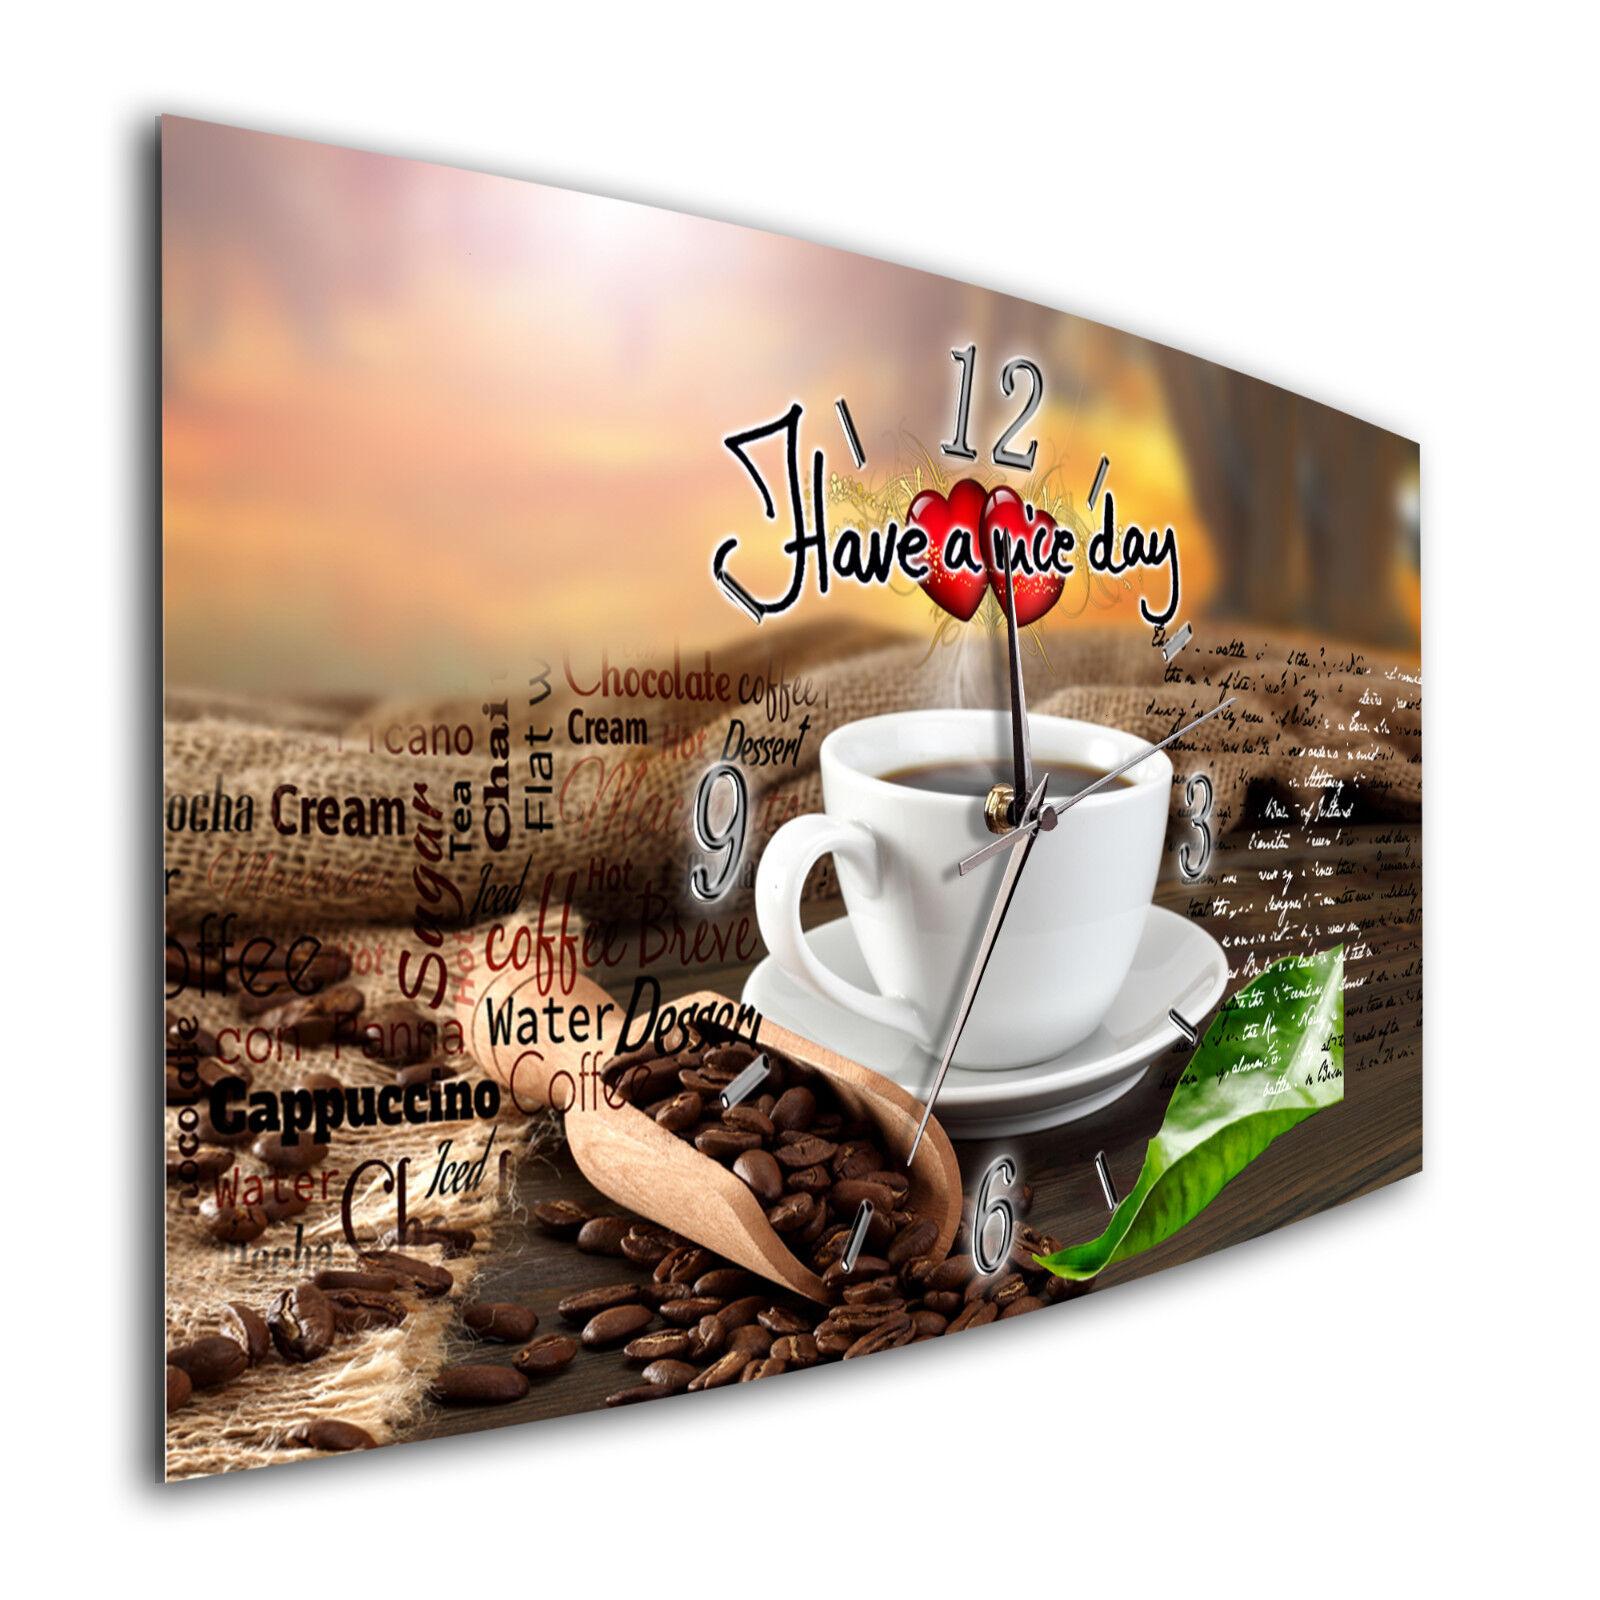 BM Wanduhr leises Uhrwerk Funkwanduhr Quarzwanduhr 8356-1a Kaffee Kaffeetasse